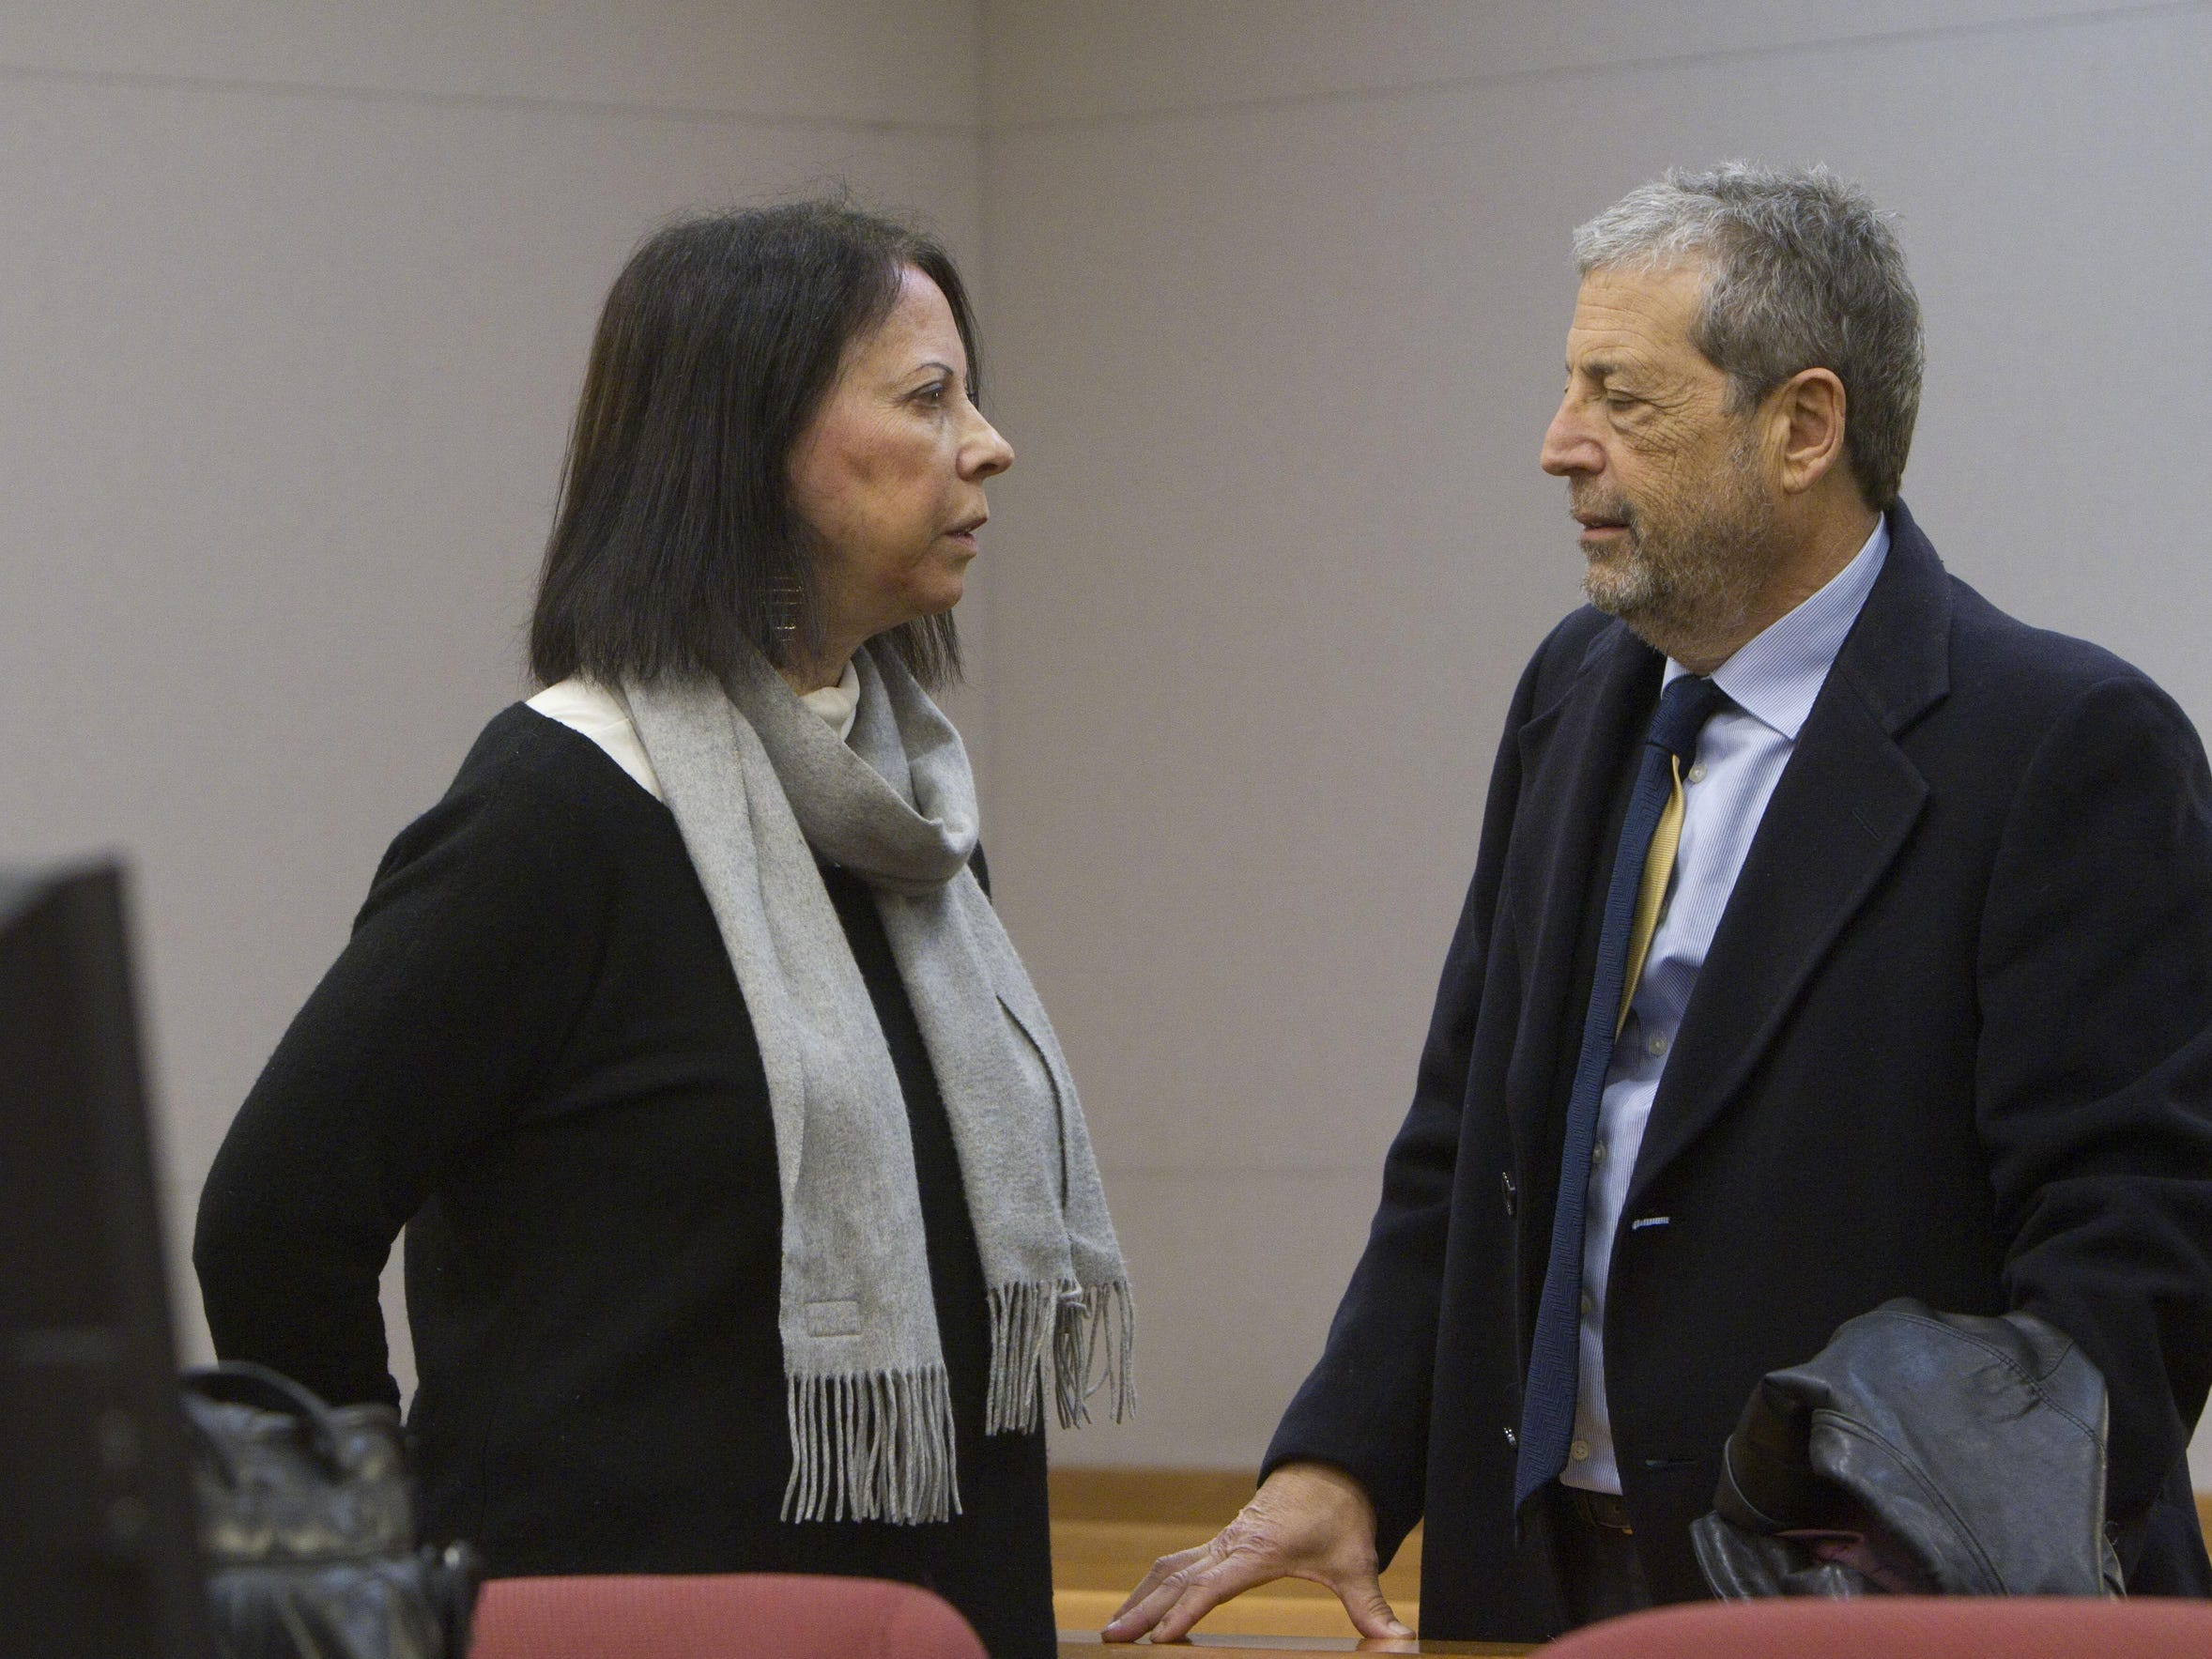 Barbara Lieberman with her husband, David, in state